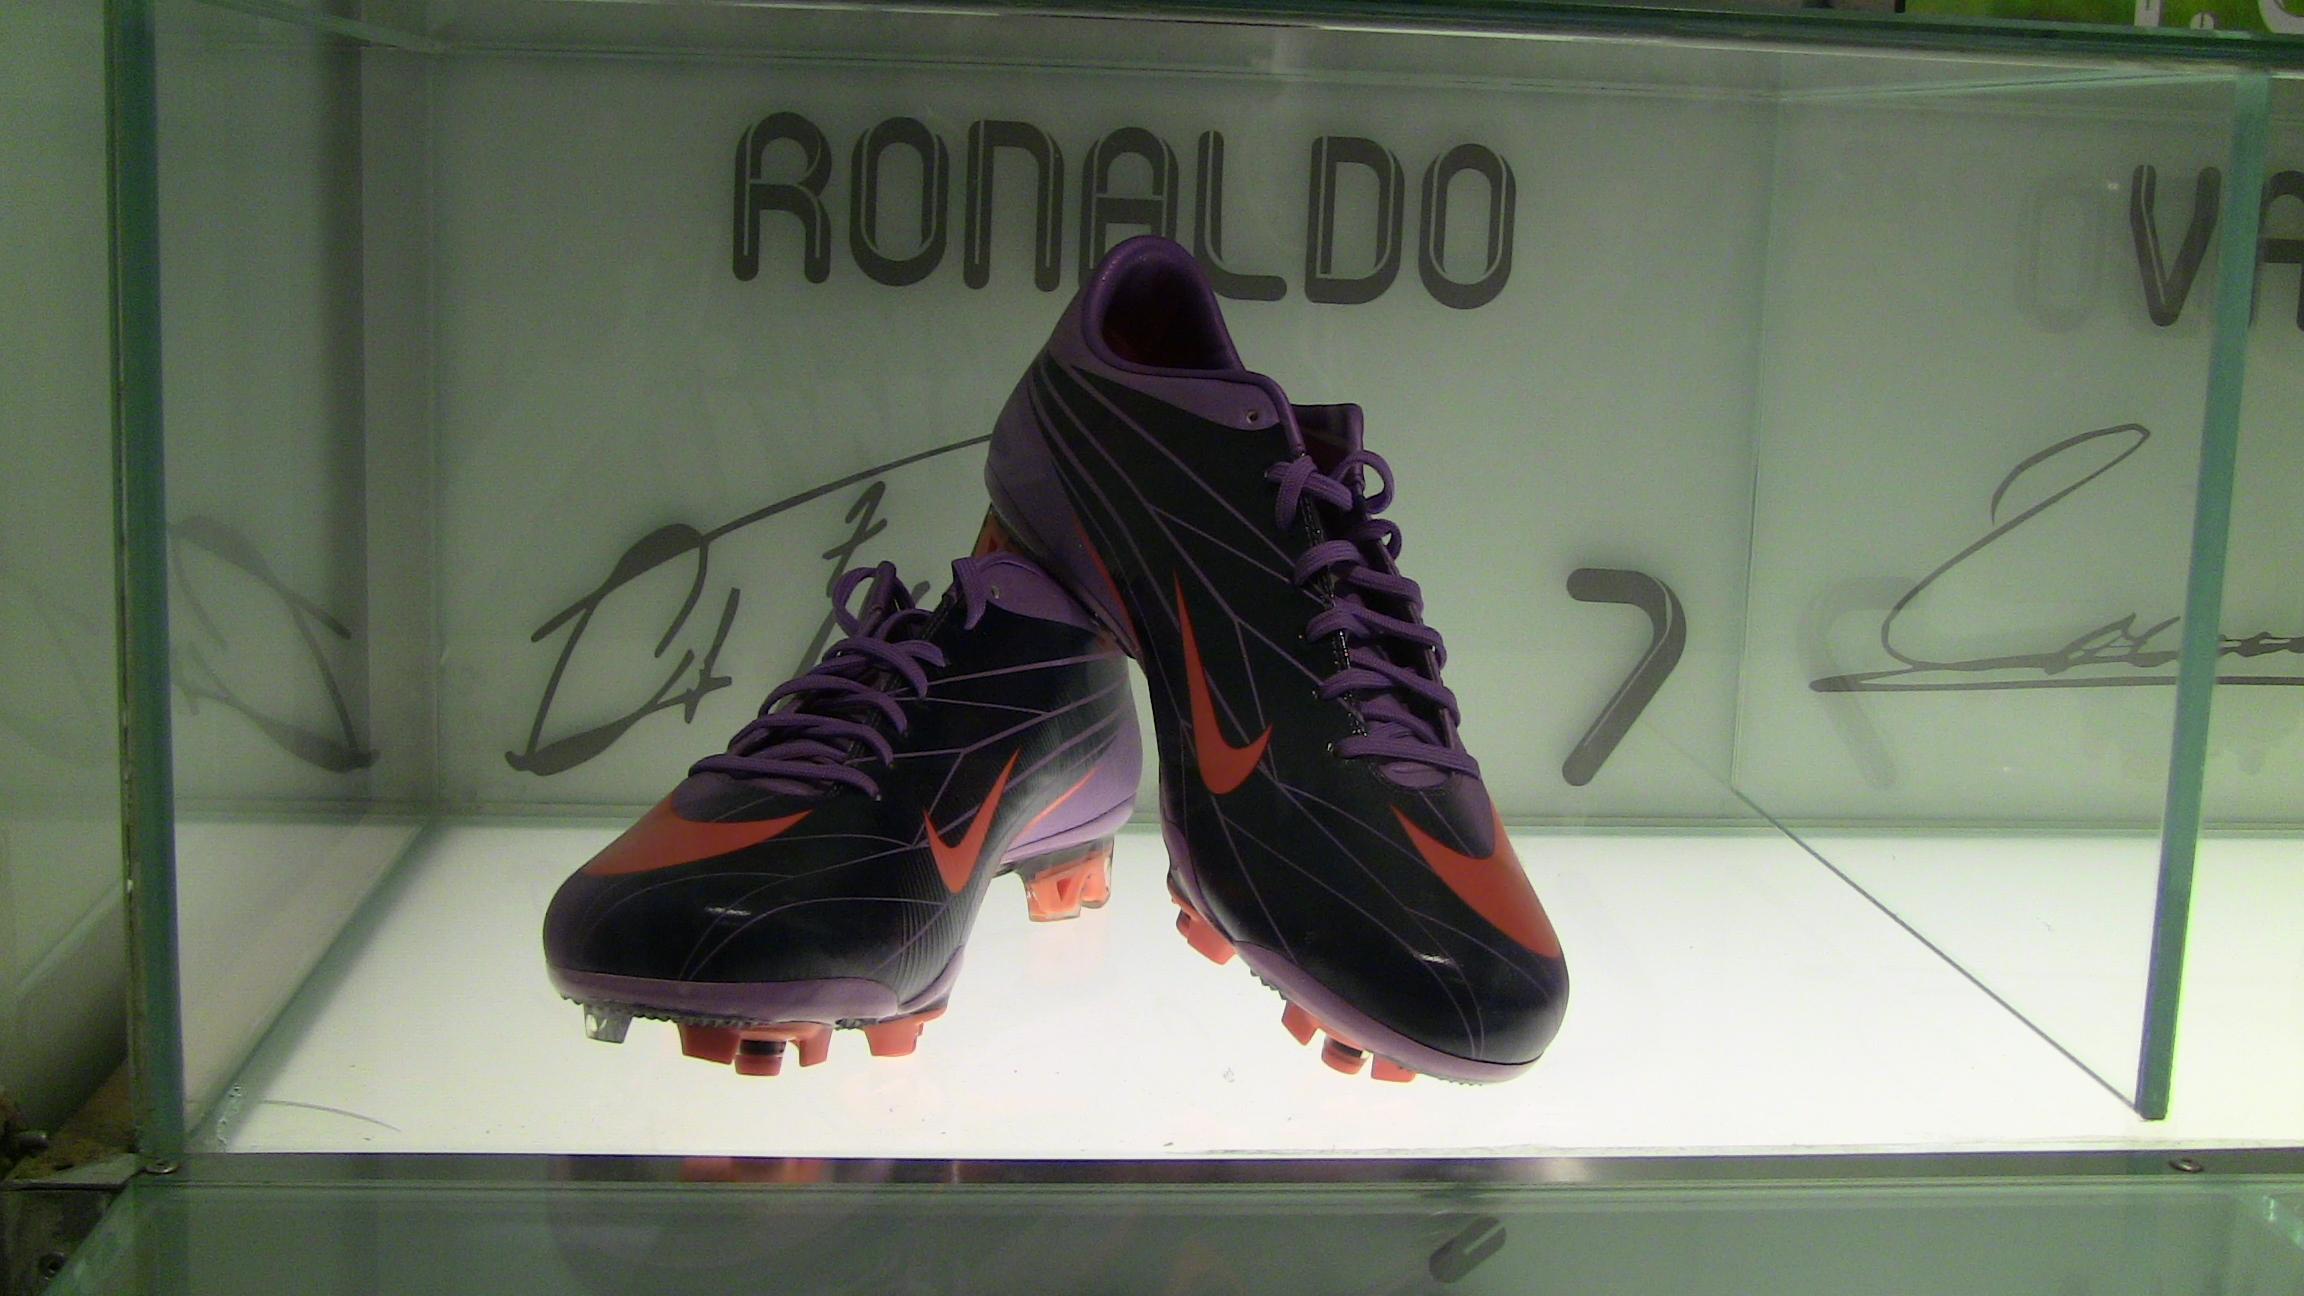 83891a6771e File Cristiano Ronaldo Boots on display at Santiago Bernabeu.jpg ...